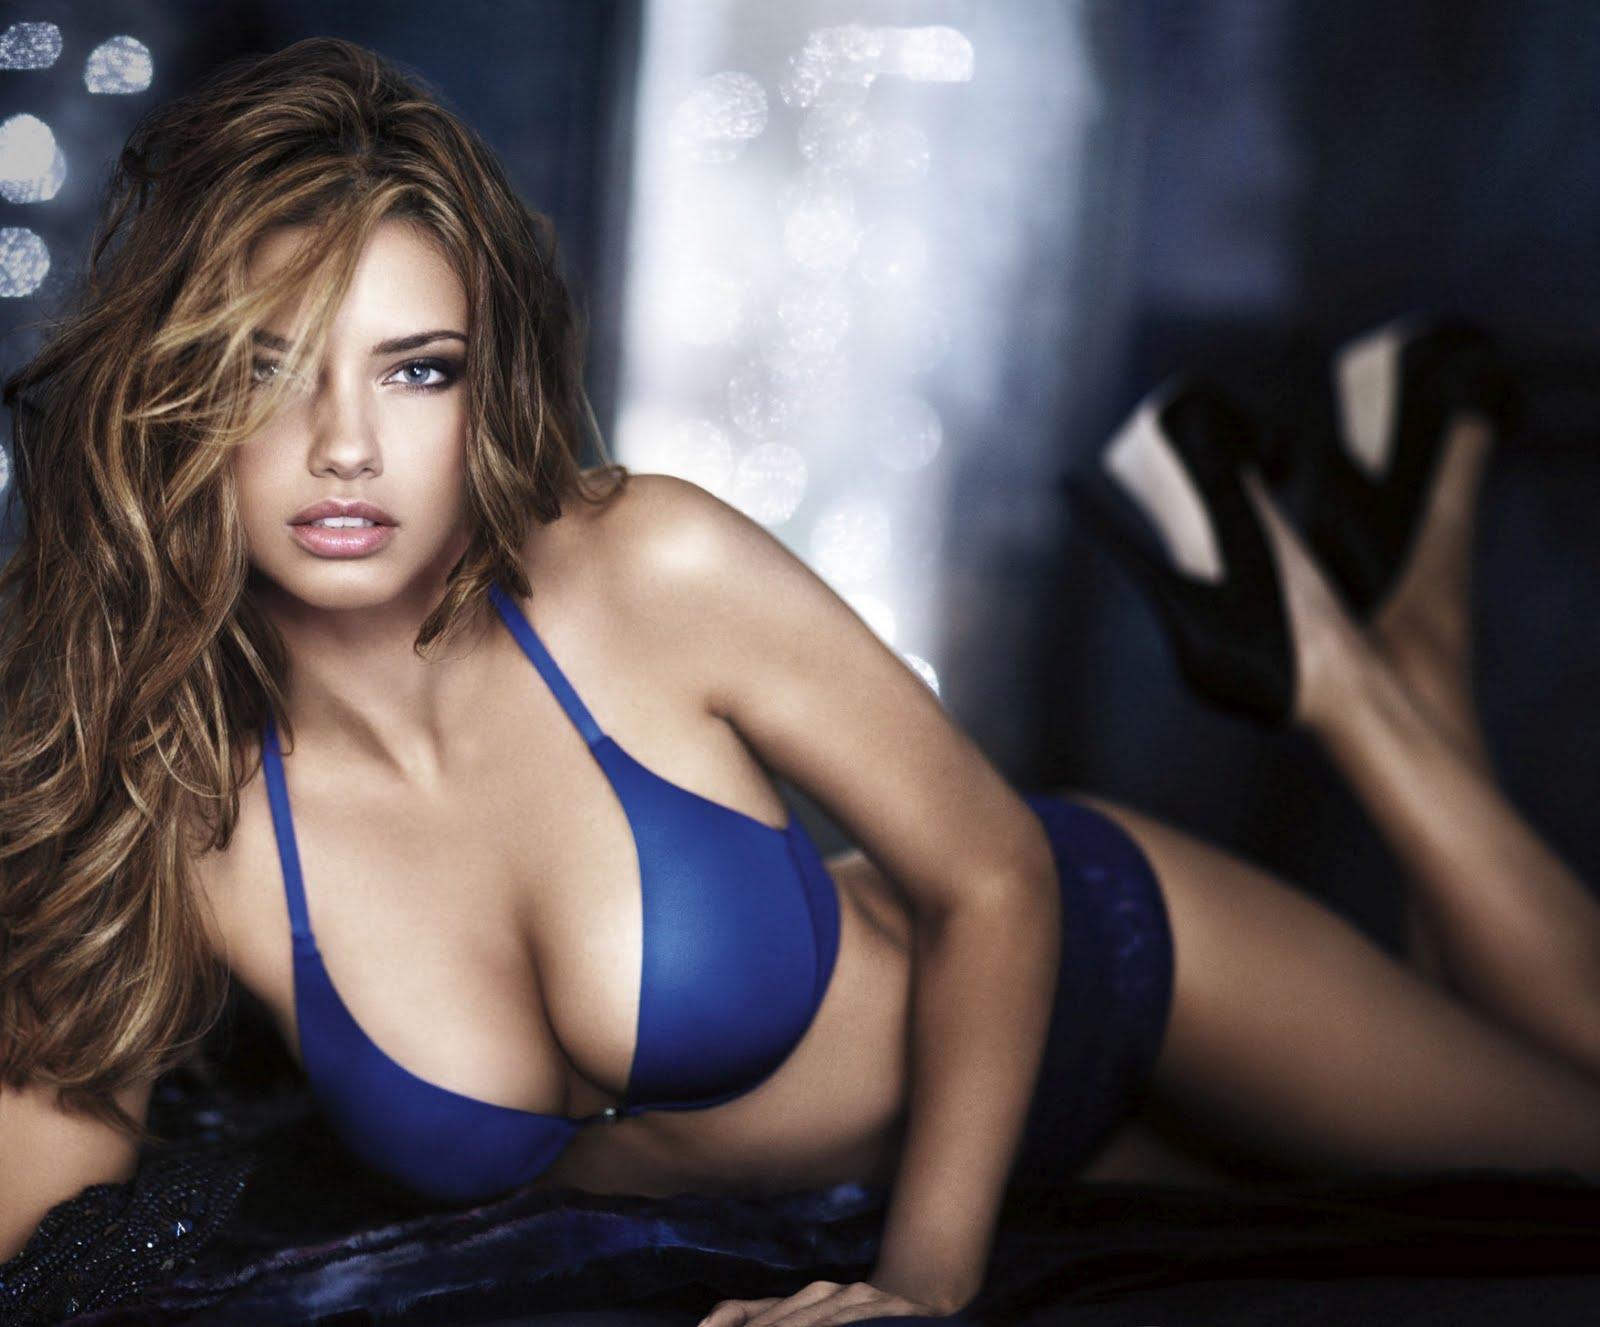 ... lingerie models hermosas mujeres mulheres belleza bellezas adrianita